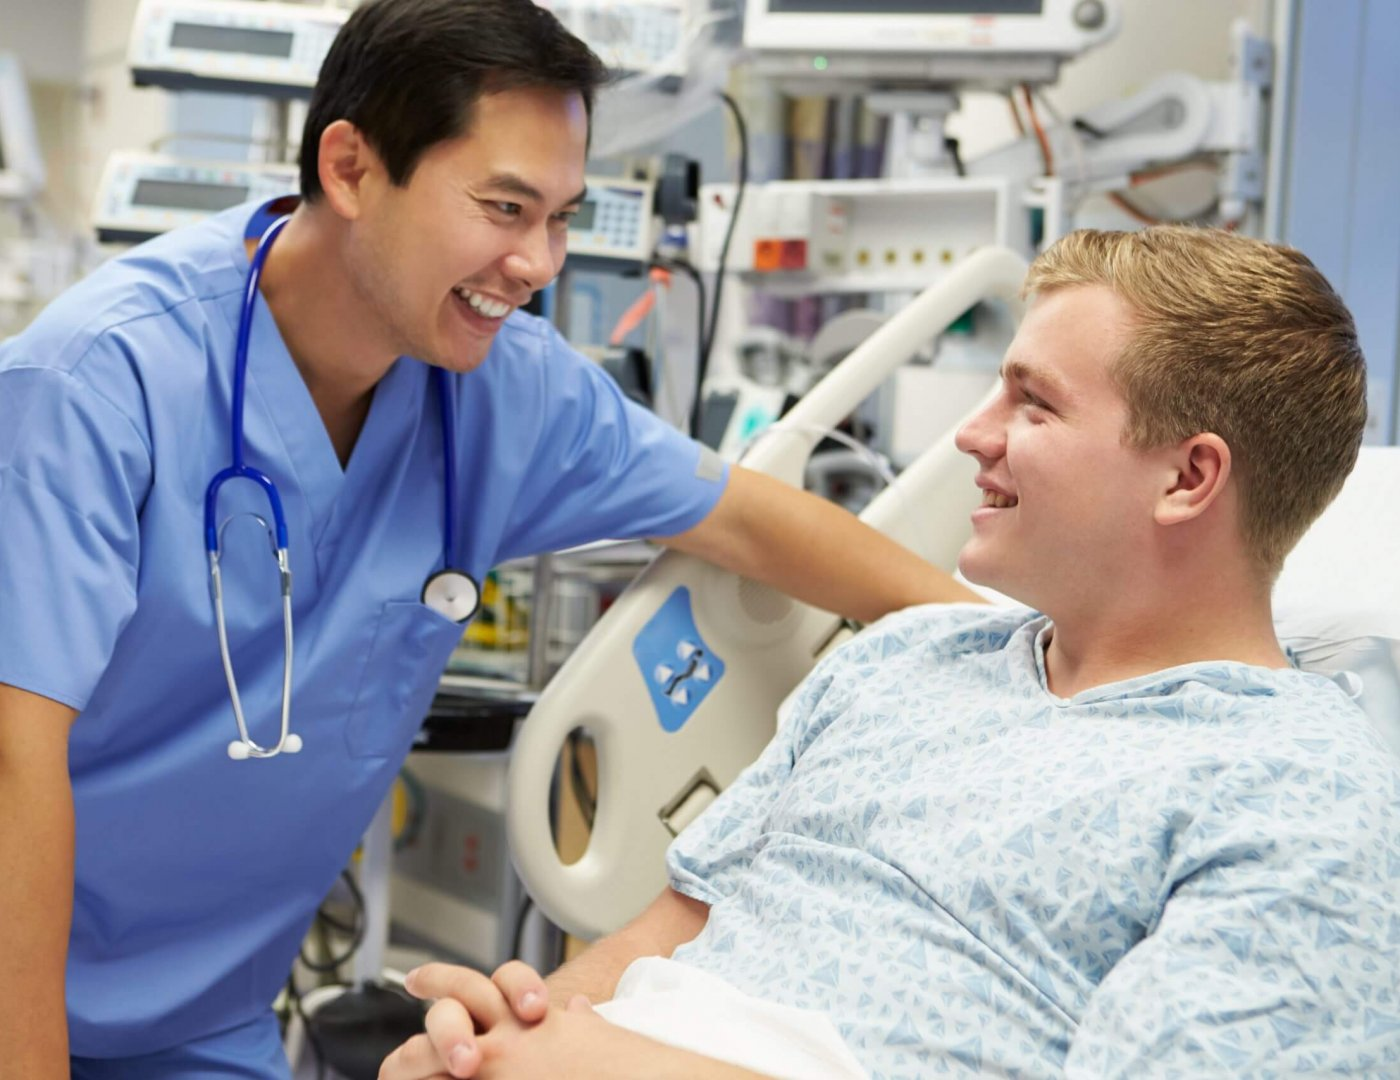 Patient care technician in hospital talking with young patient, patient care technician patient communication